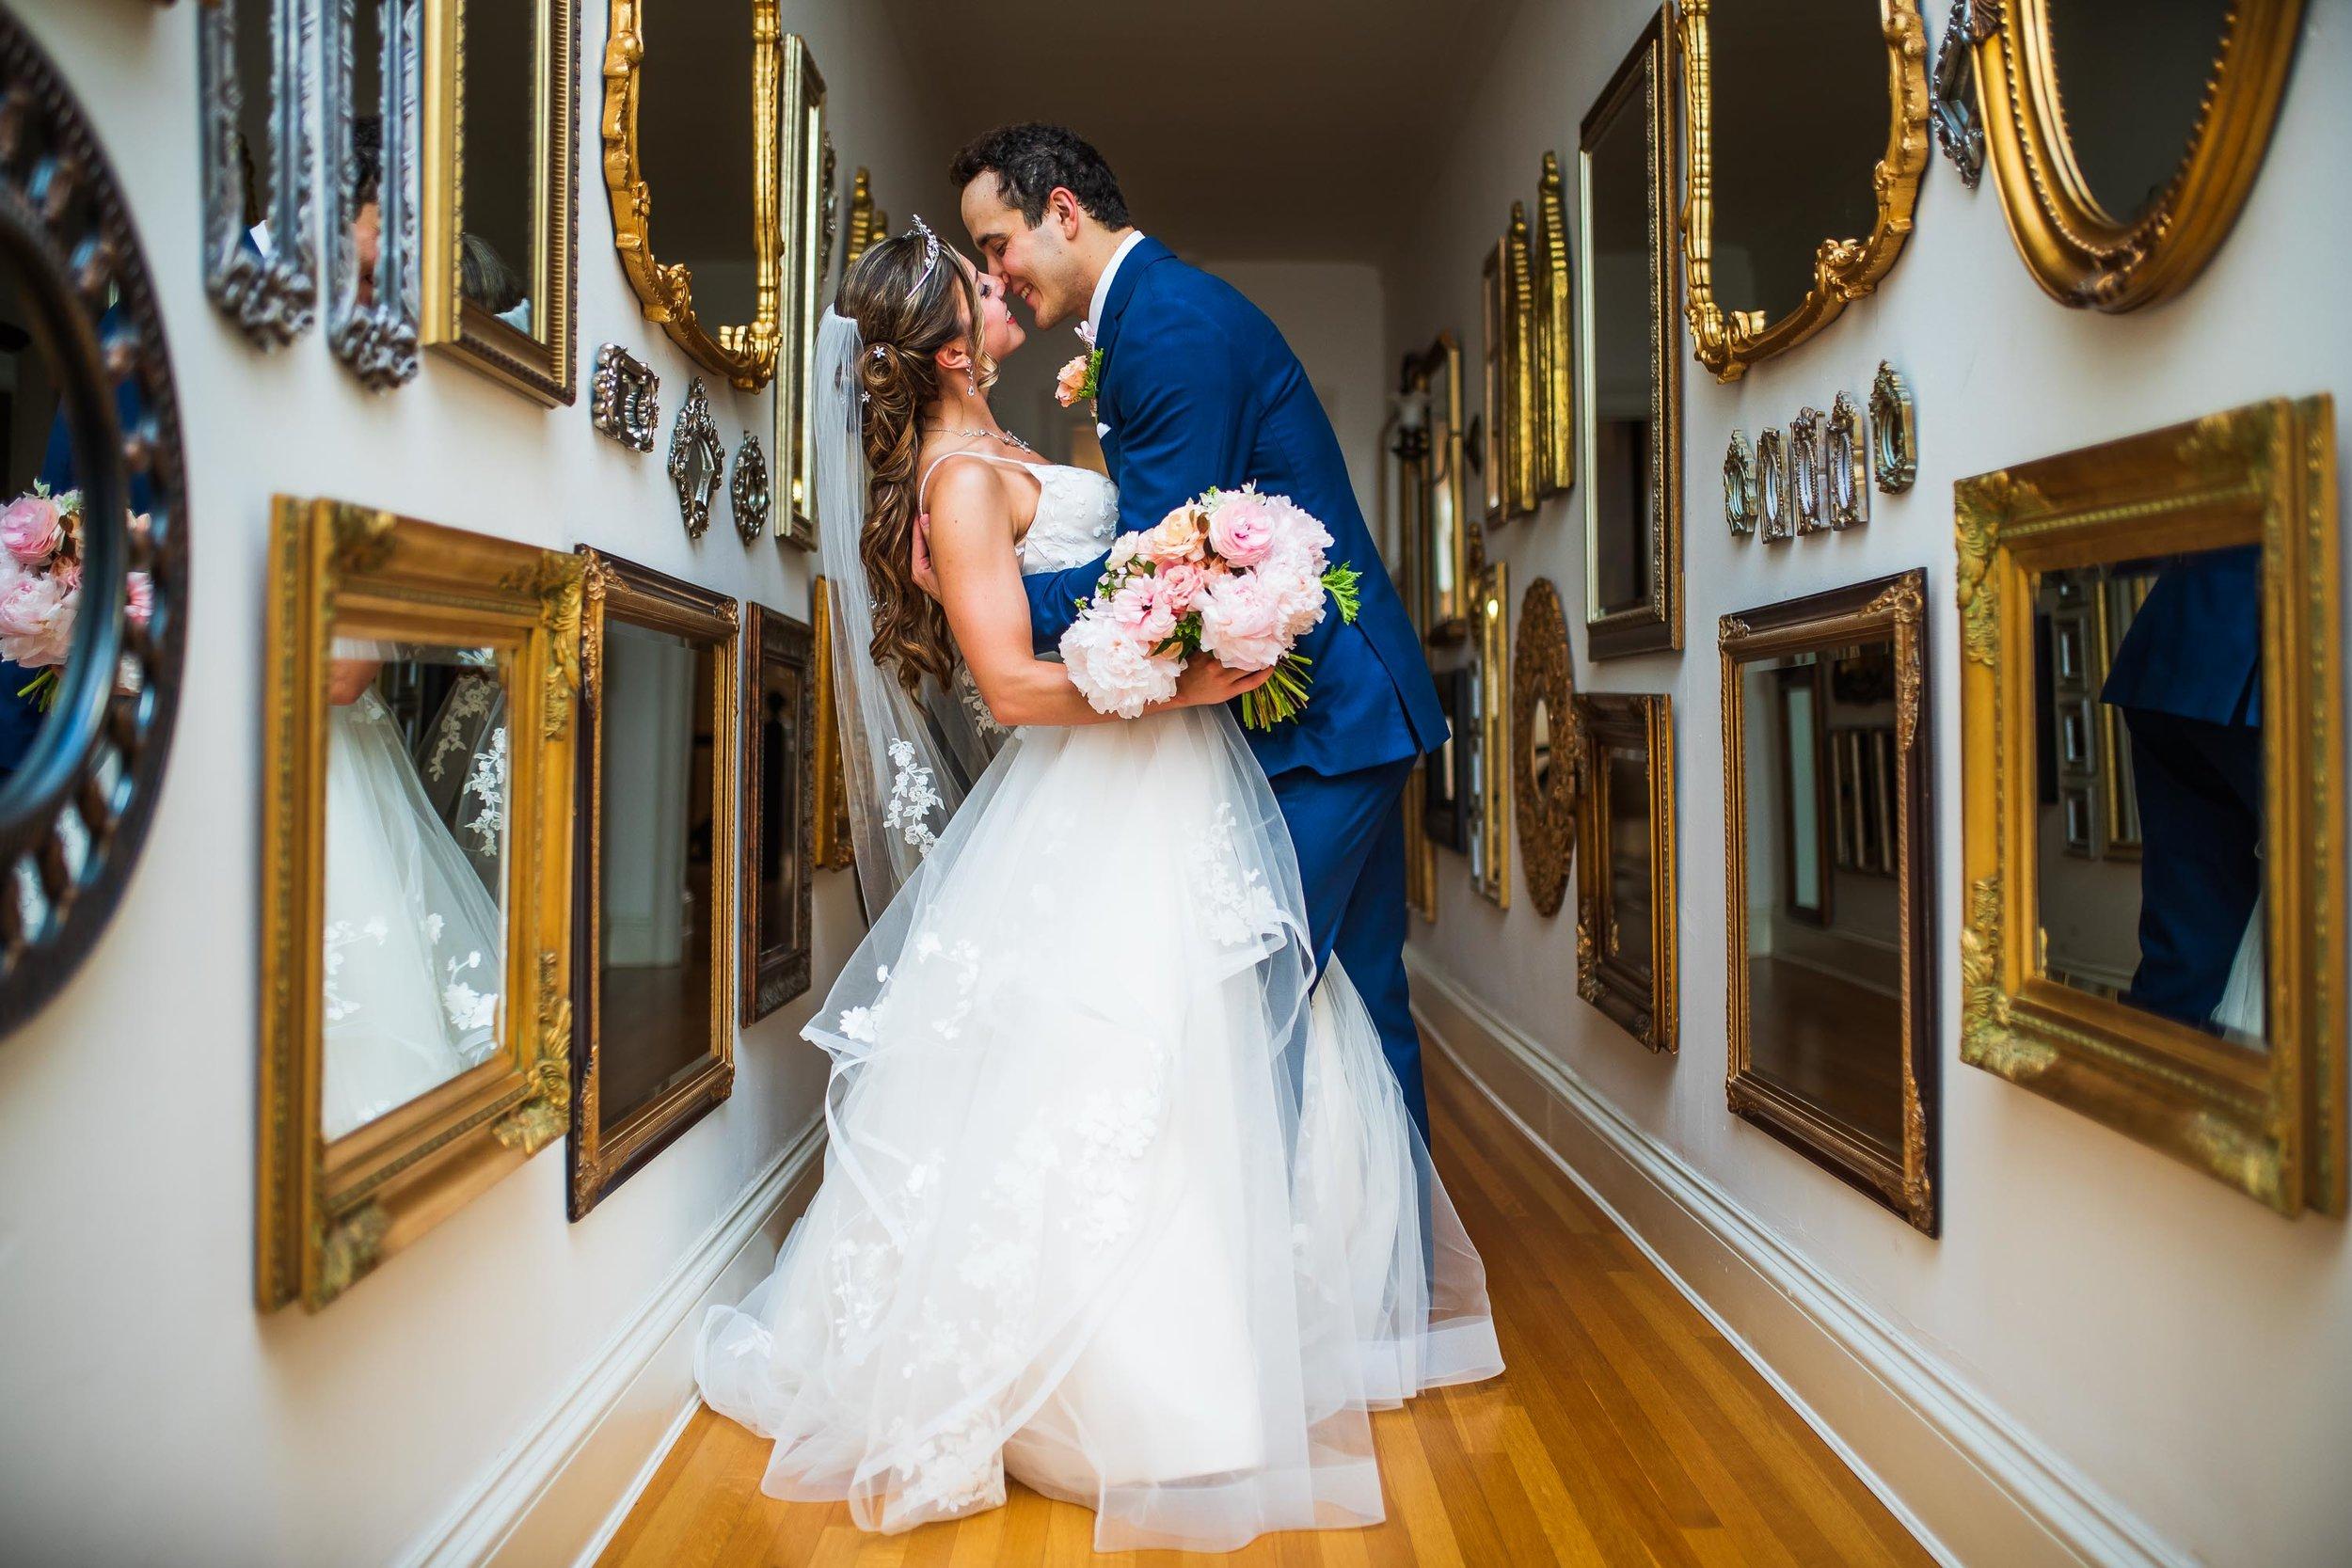 thornewood castle wedding 35.jpg